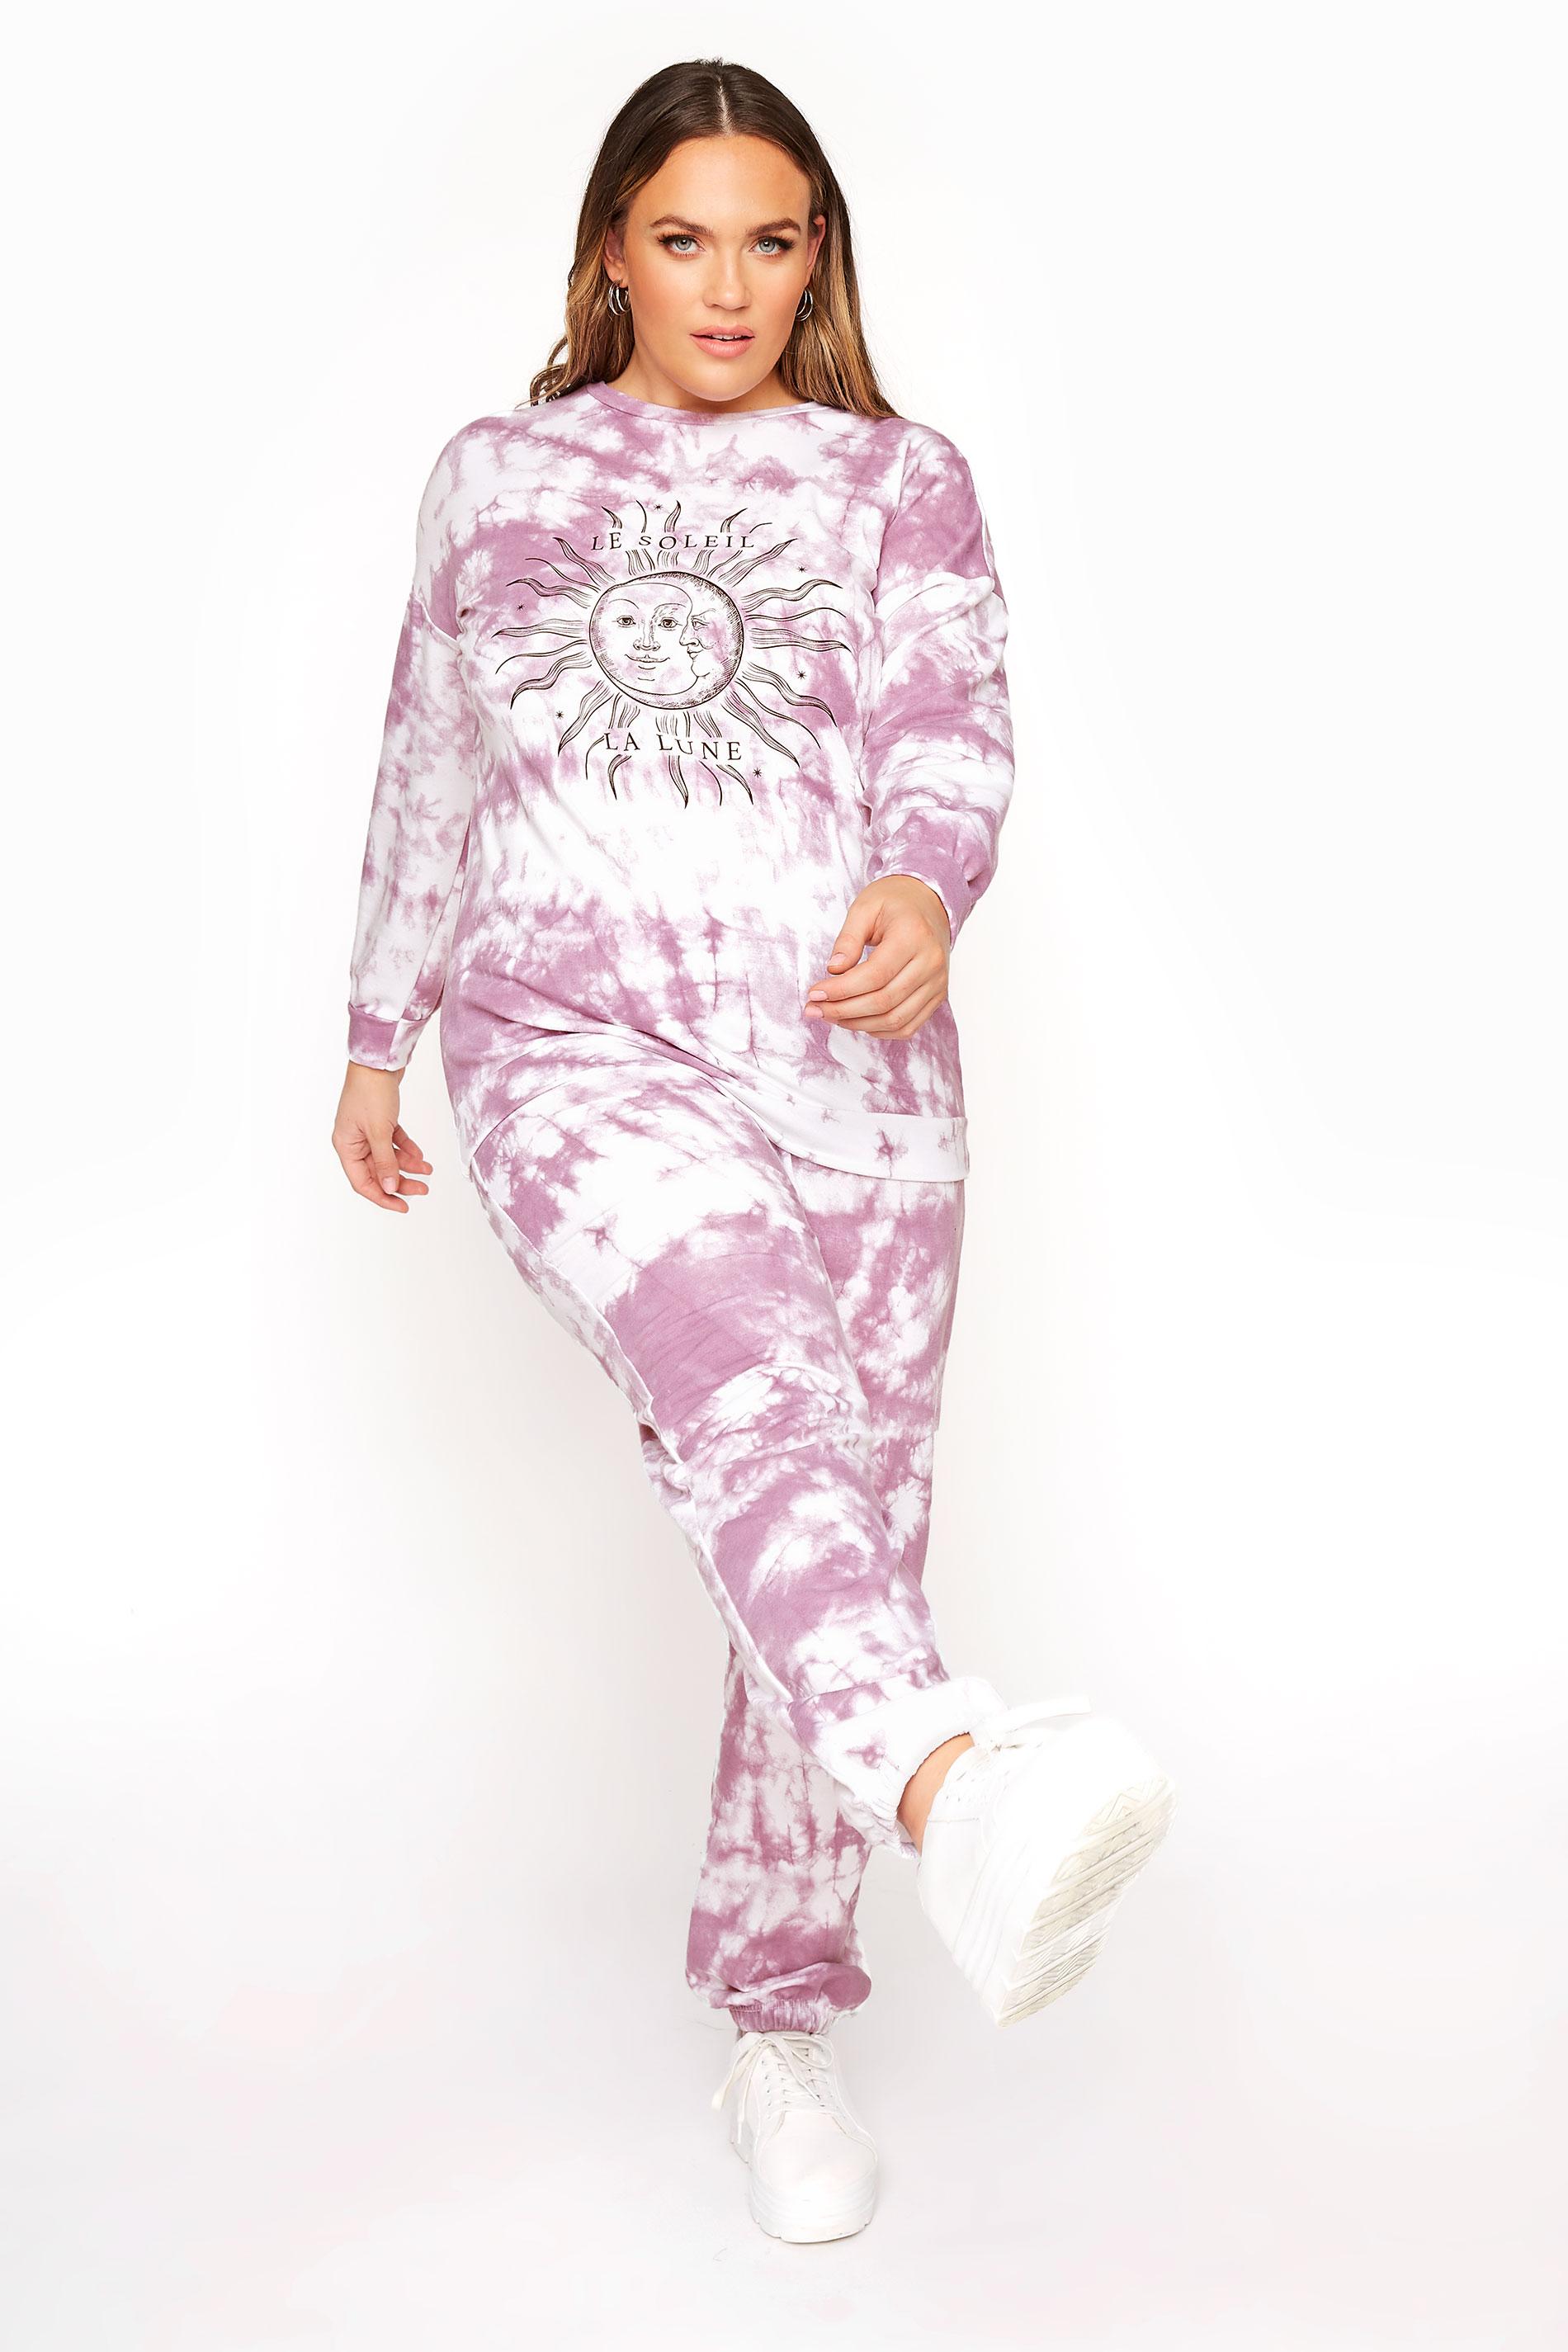 LIMITED COLLECTION Lilafarbenes Batik Sweatshirt mit 'Le Soleil' Schriftzug